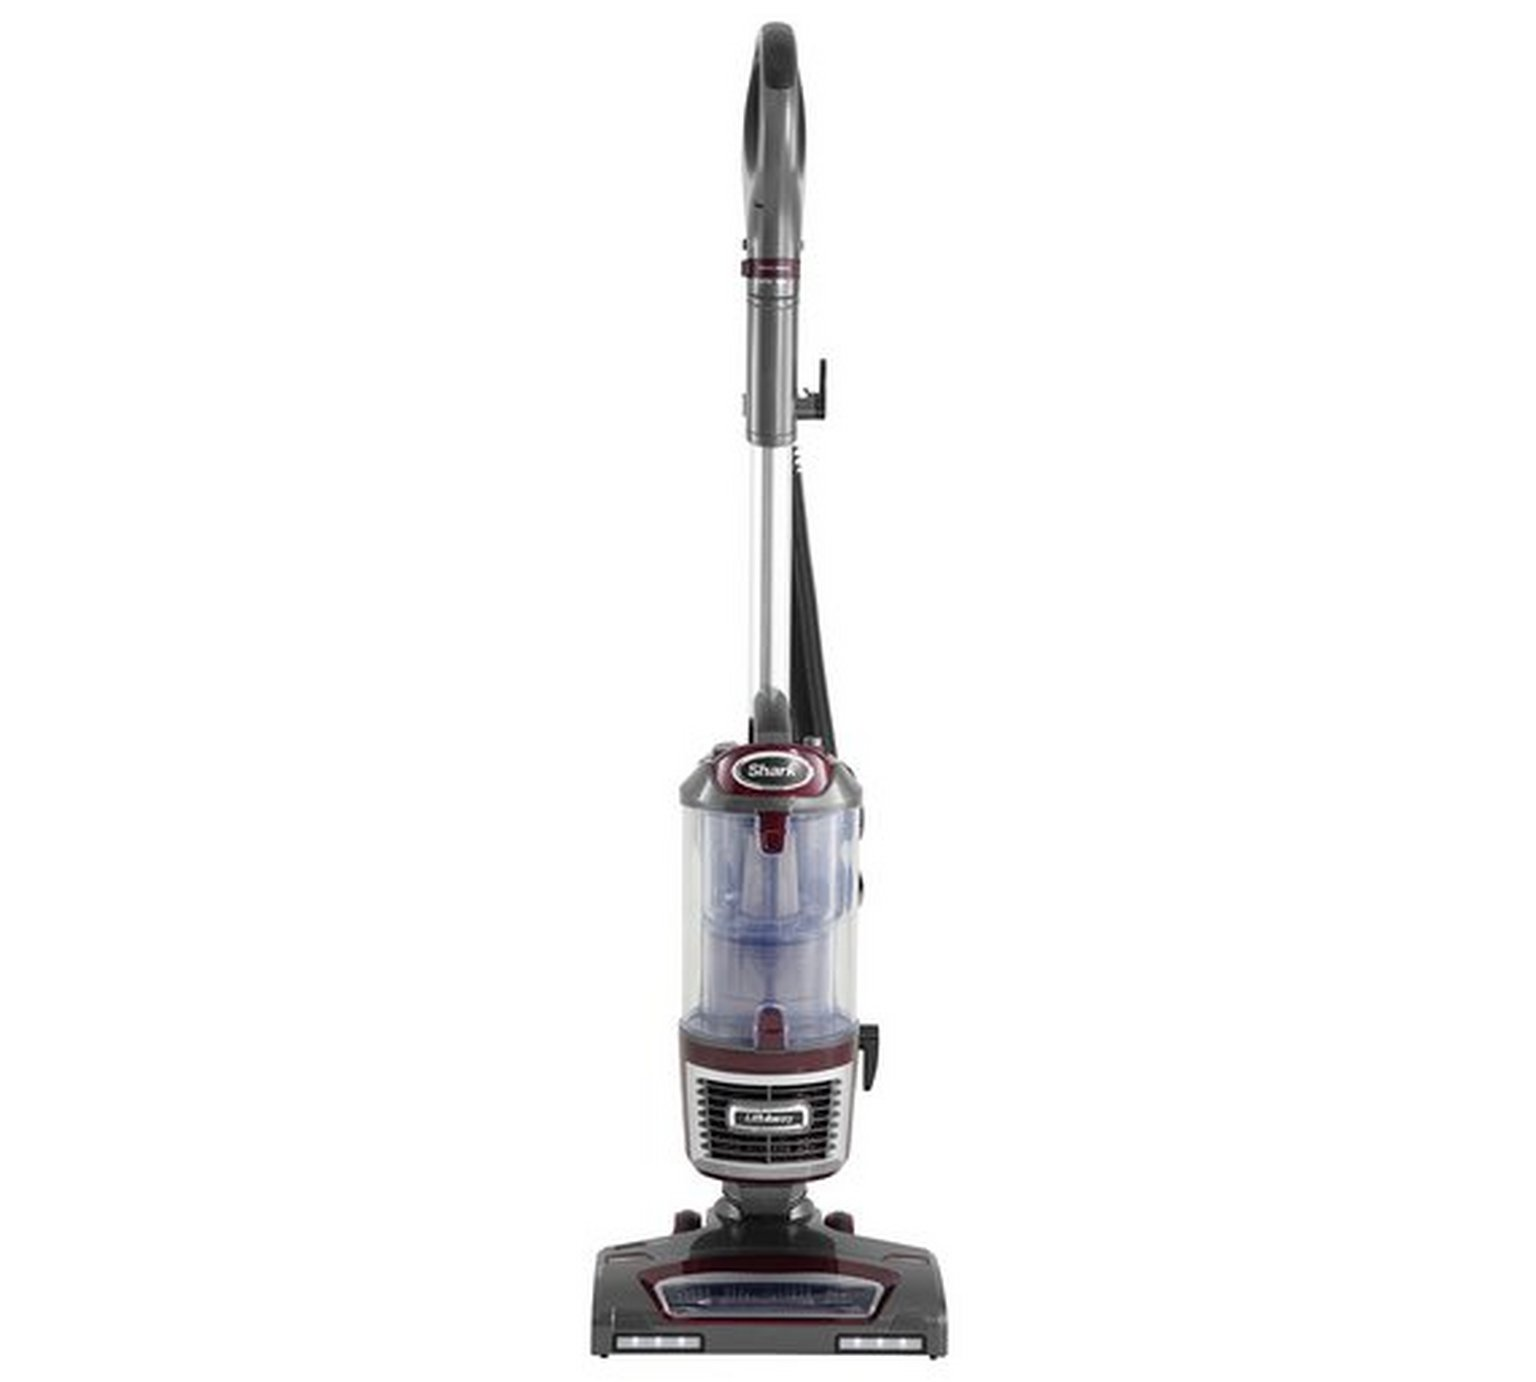 Shark NV601UKT Lift-Away True Pet Bagless Vacuum Cleaner